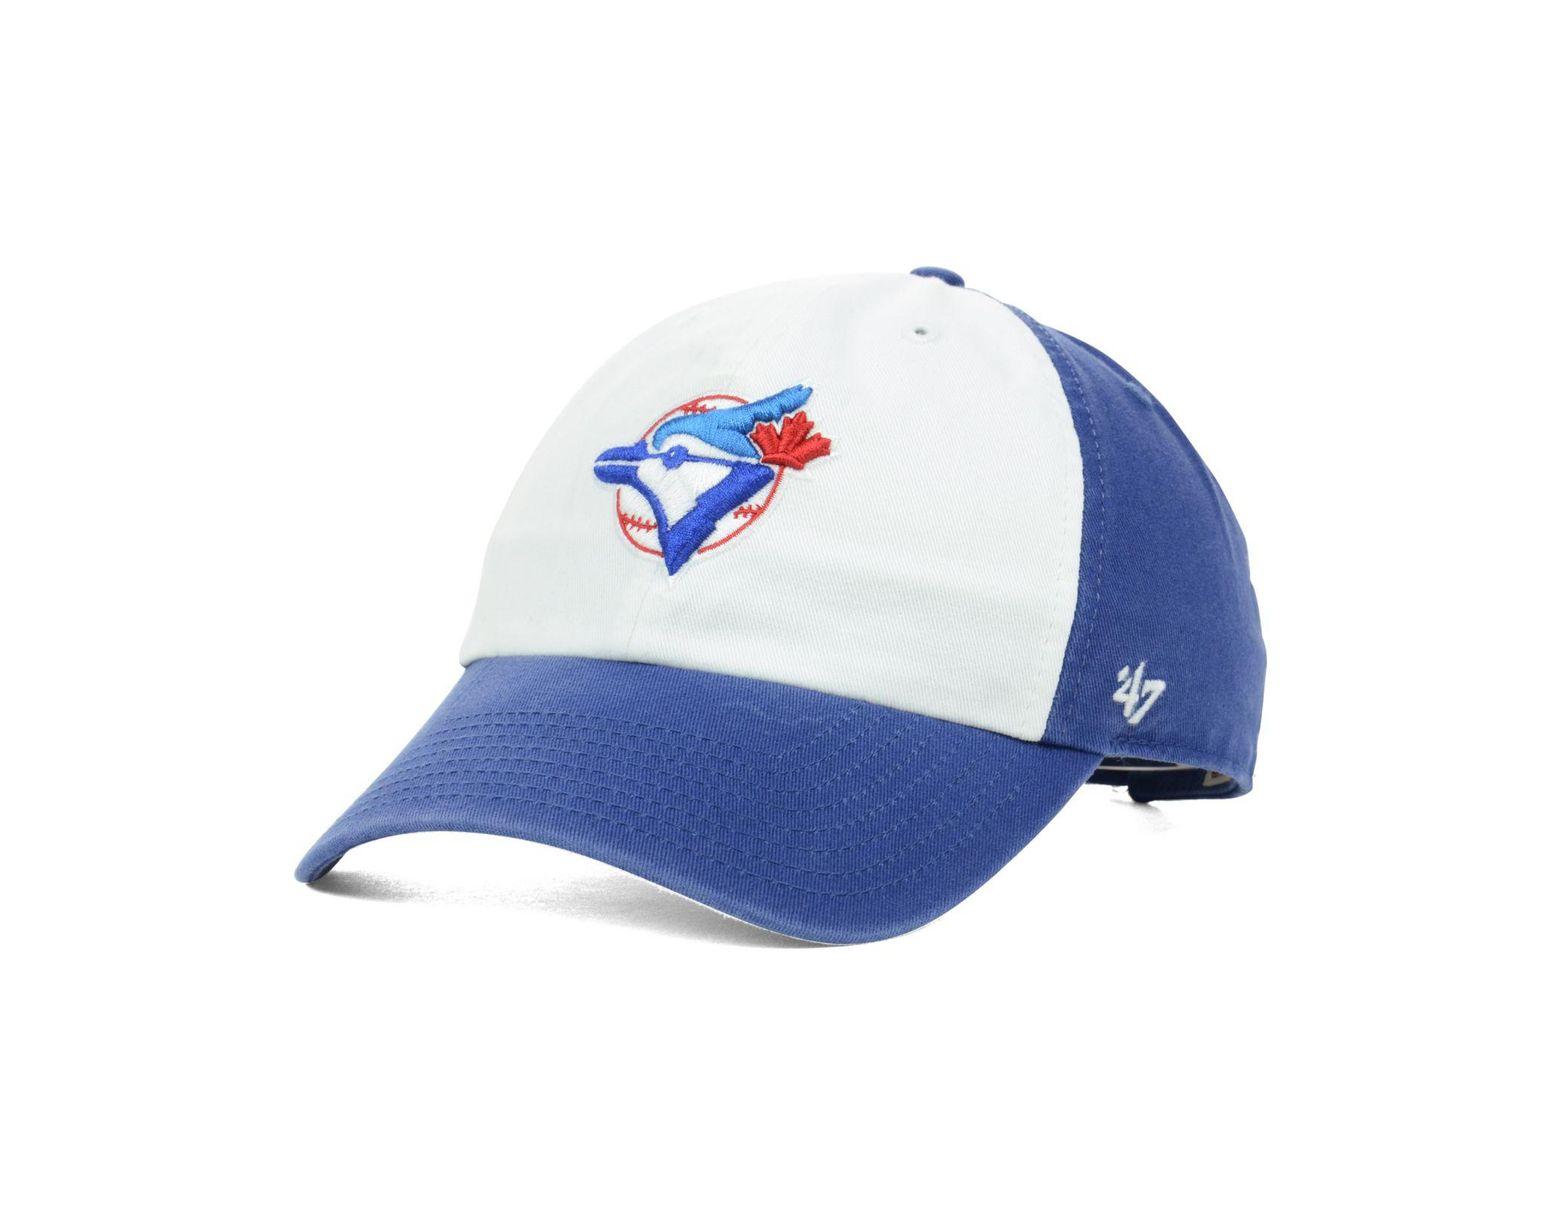 1e4dd75fe Men's White Toronto Blue Jays Clean Up Cap